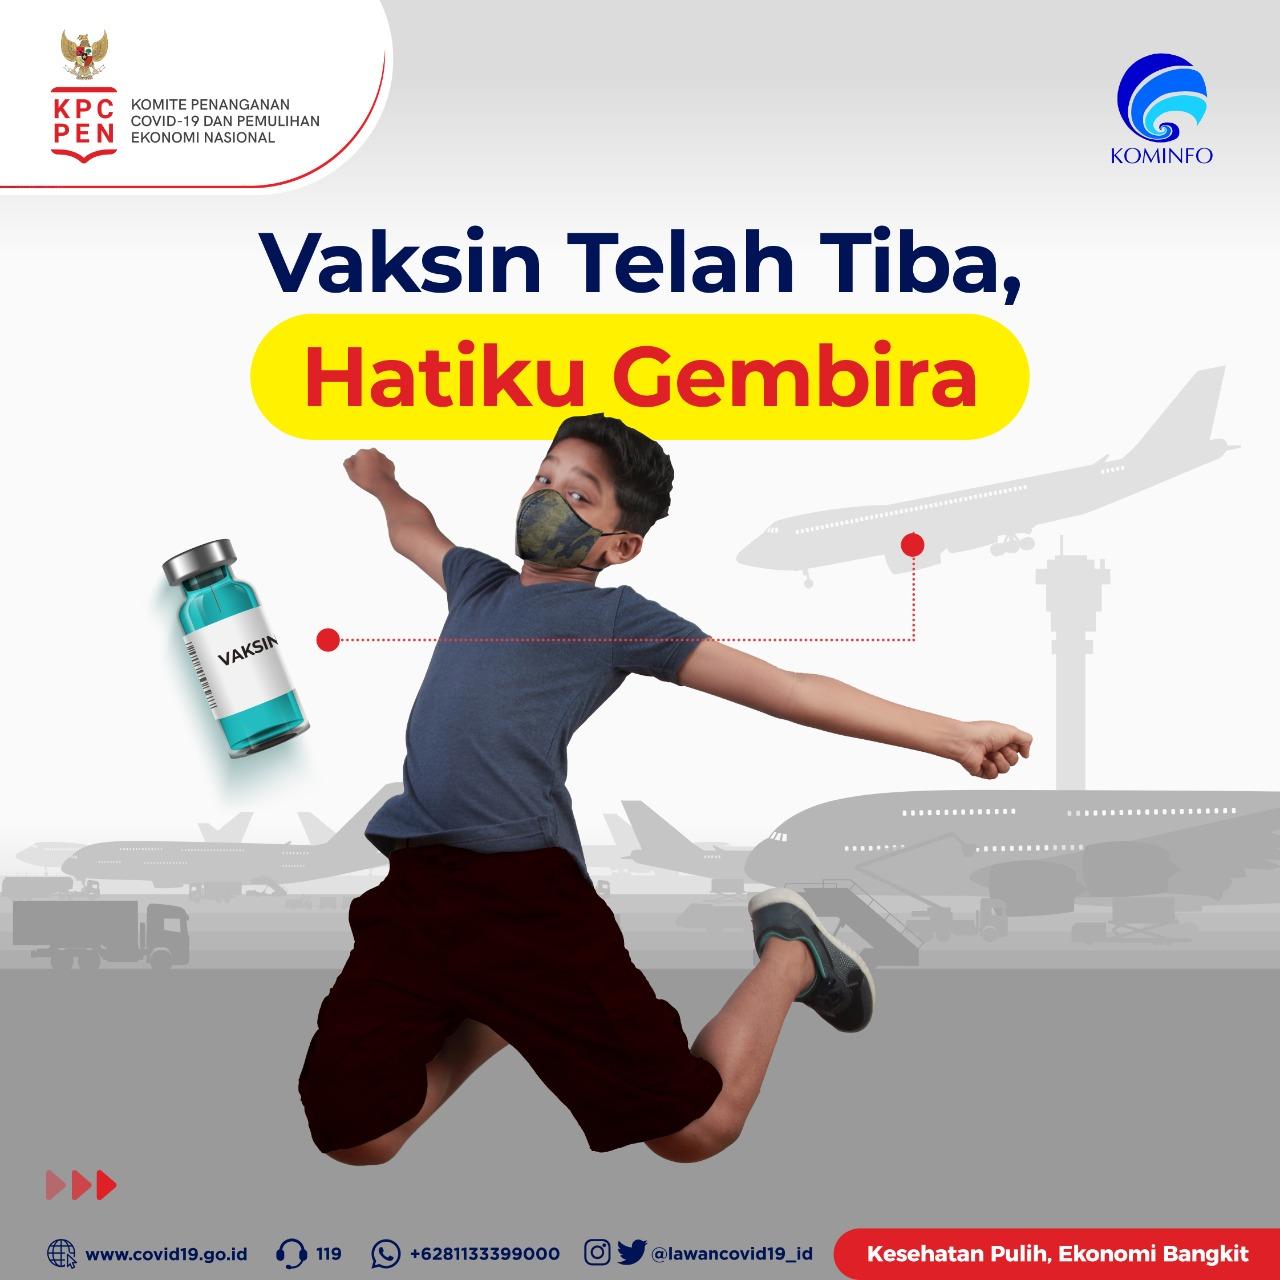 Vaksin Covid-19 telah tiba di Indonesia